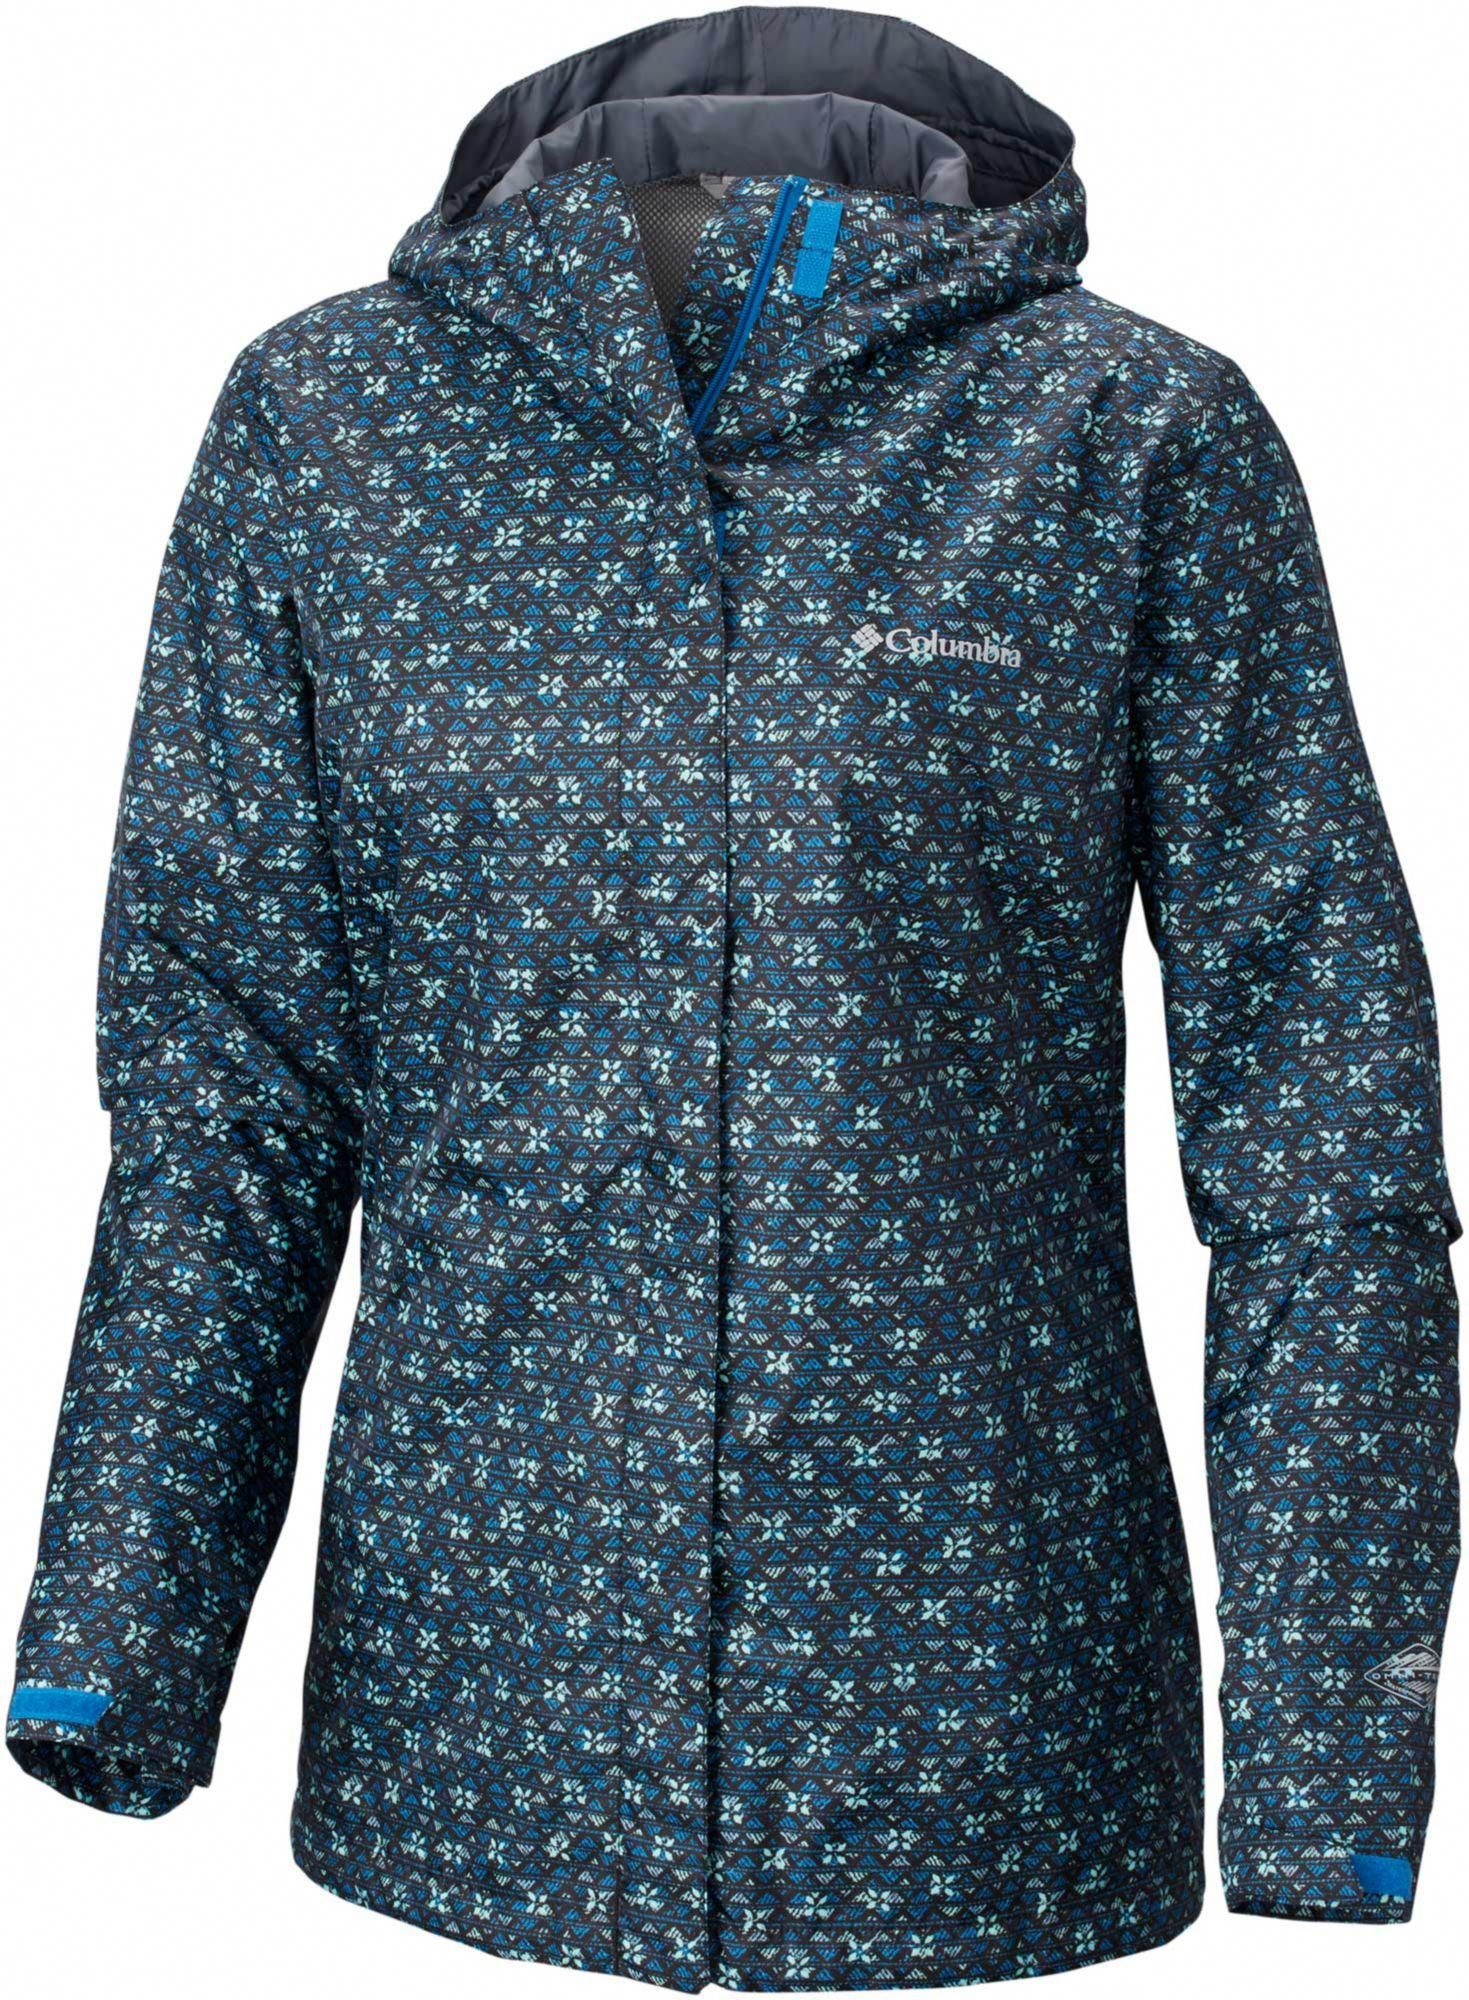 Columbia Women S Arcadia Print Rain Jacket Size Large Jewel Stripe Print Womenskhakiraincoat Rain Jacket Women Black Rain Jacket Best Rain Jacket